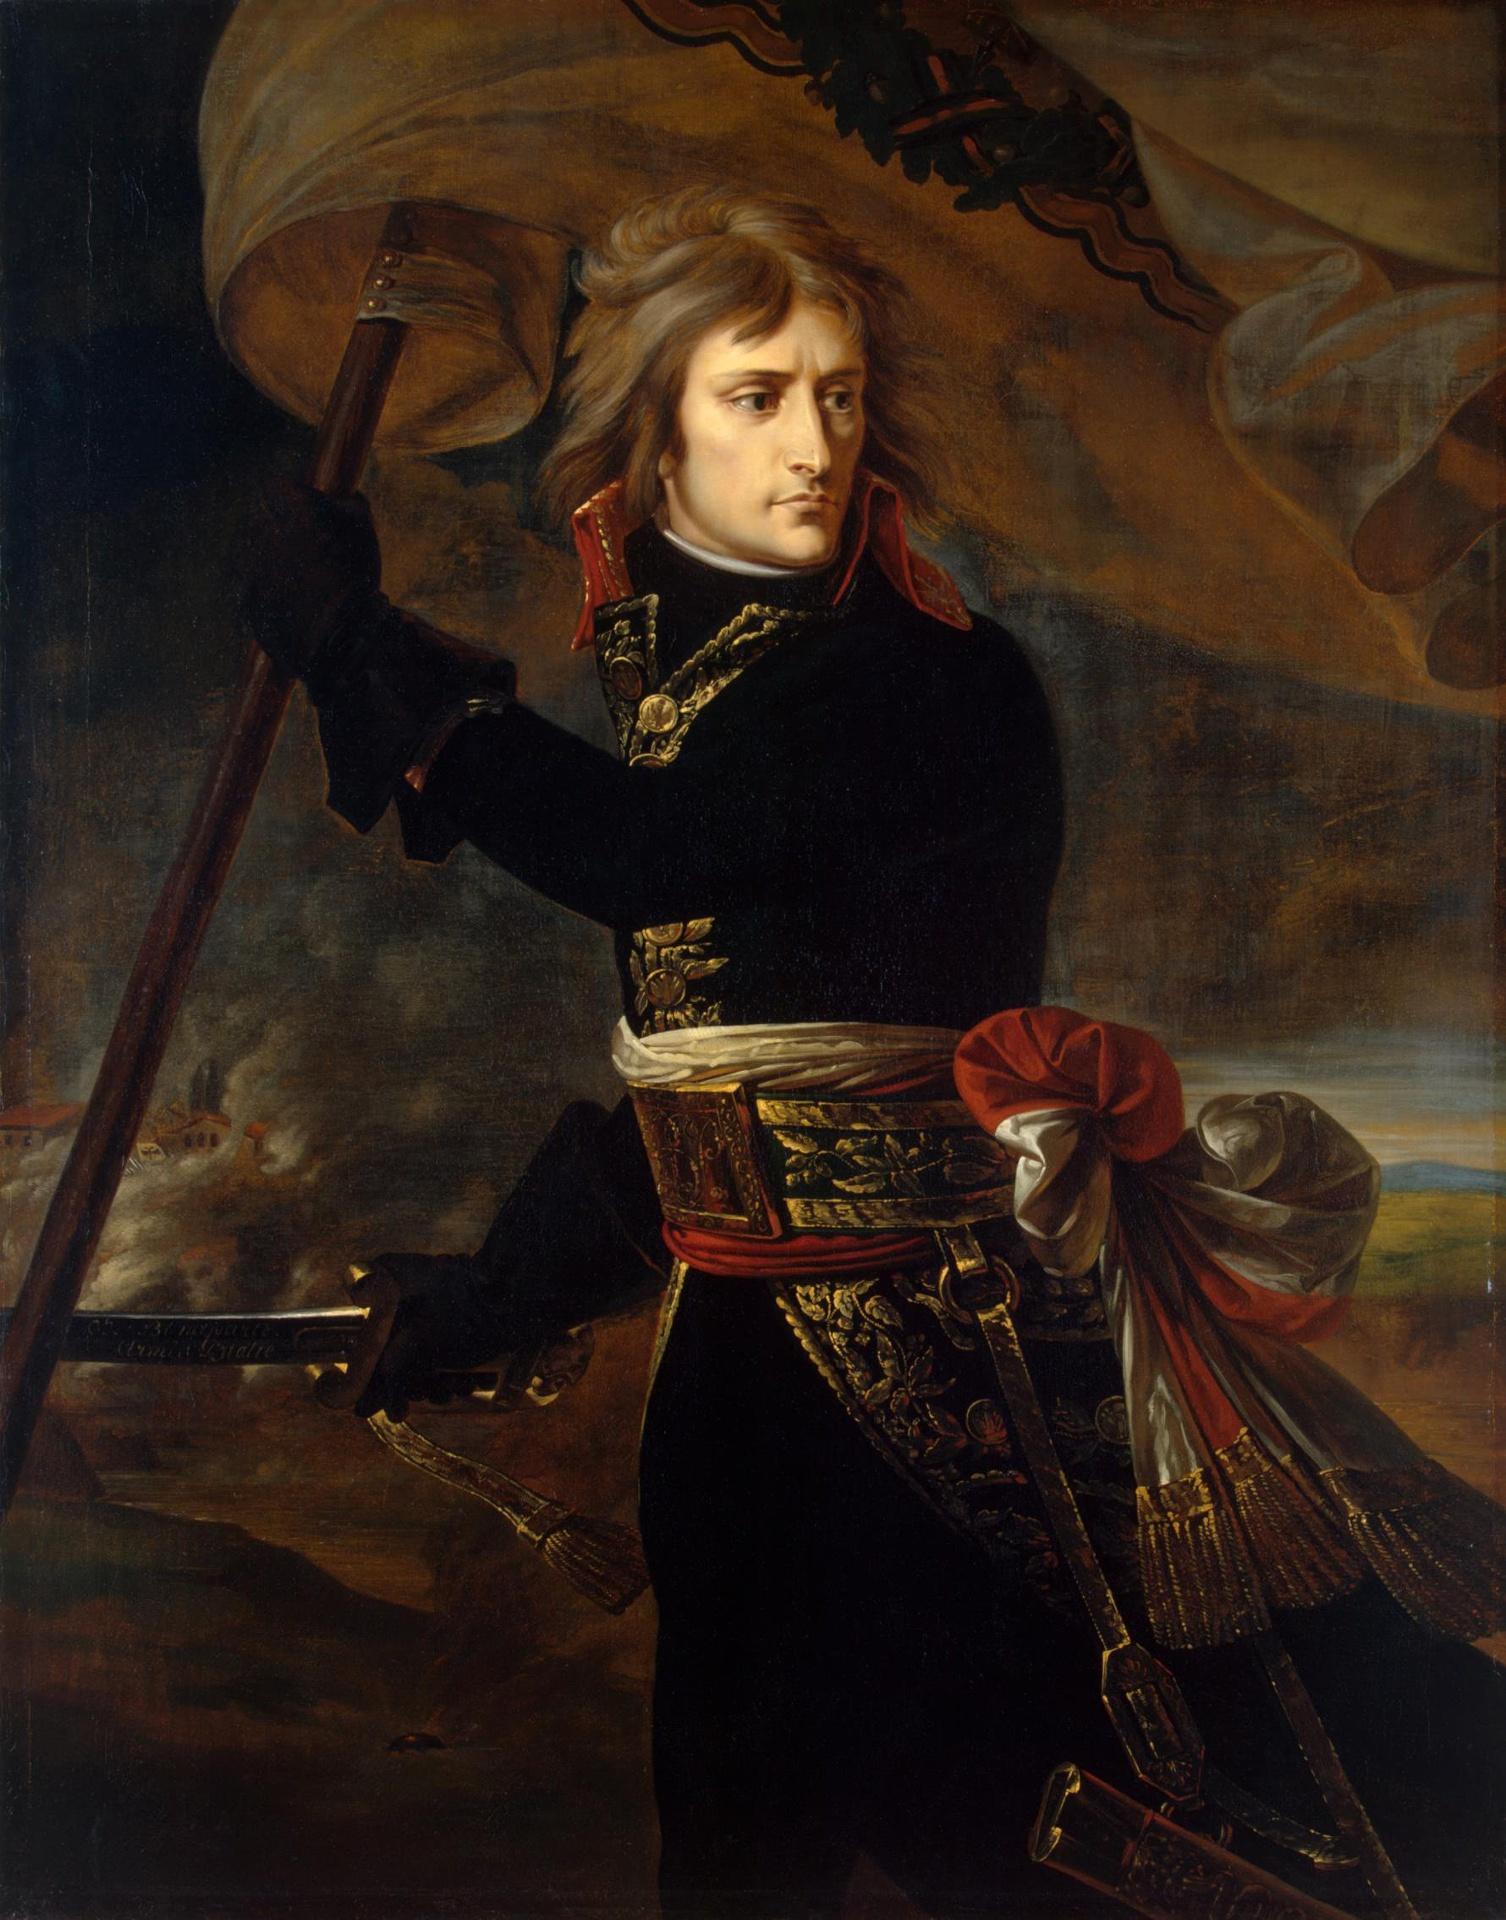 Antoine-Jean Gros, Napoleon Bonaparte on the Bridge at Arcole, late 1796 - early 1797, oil on canvas, cm 134X104, Hermitage Museum